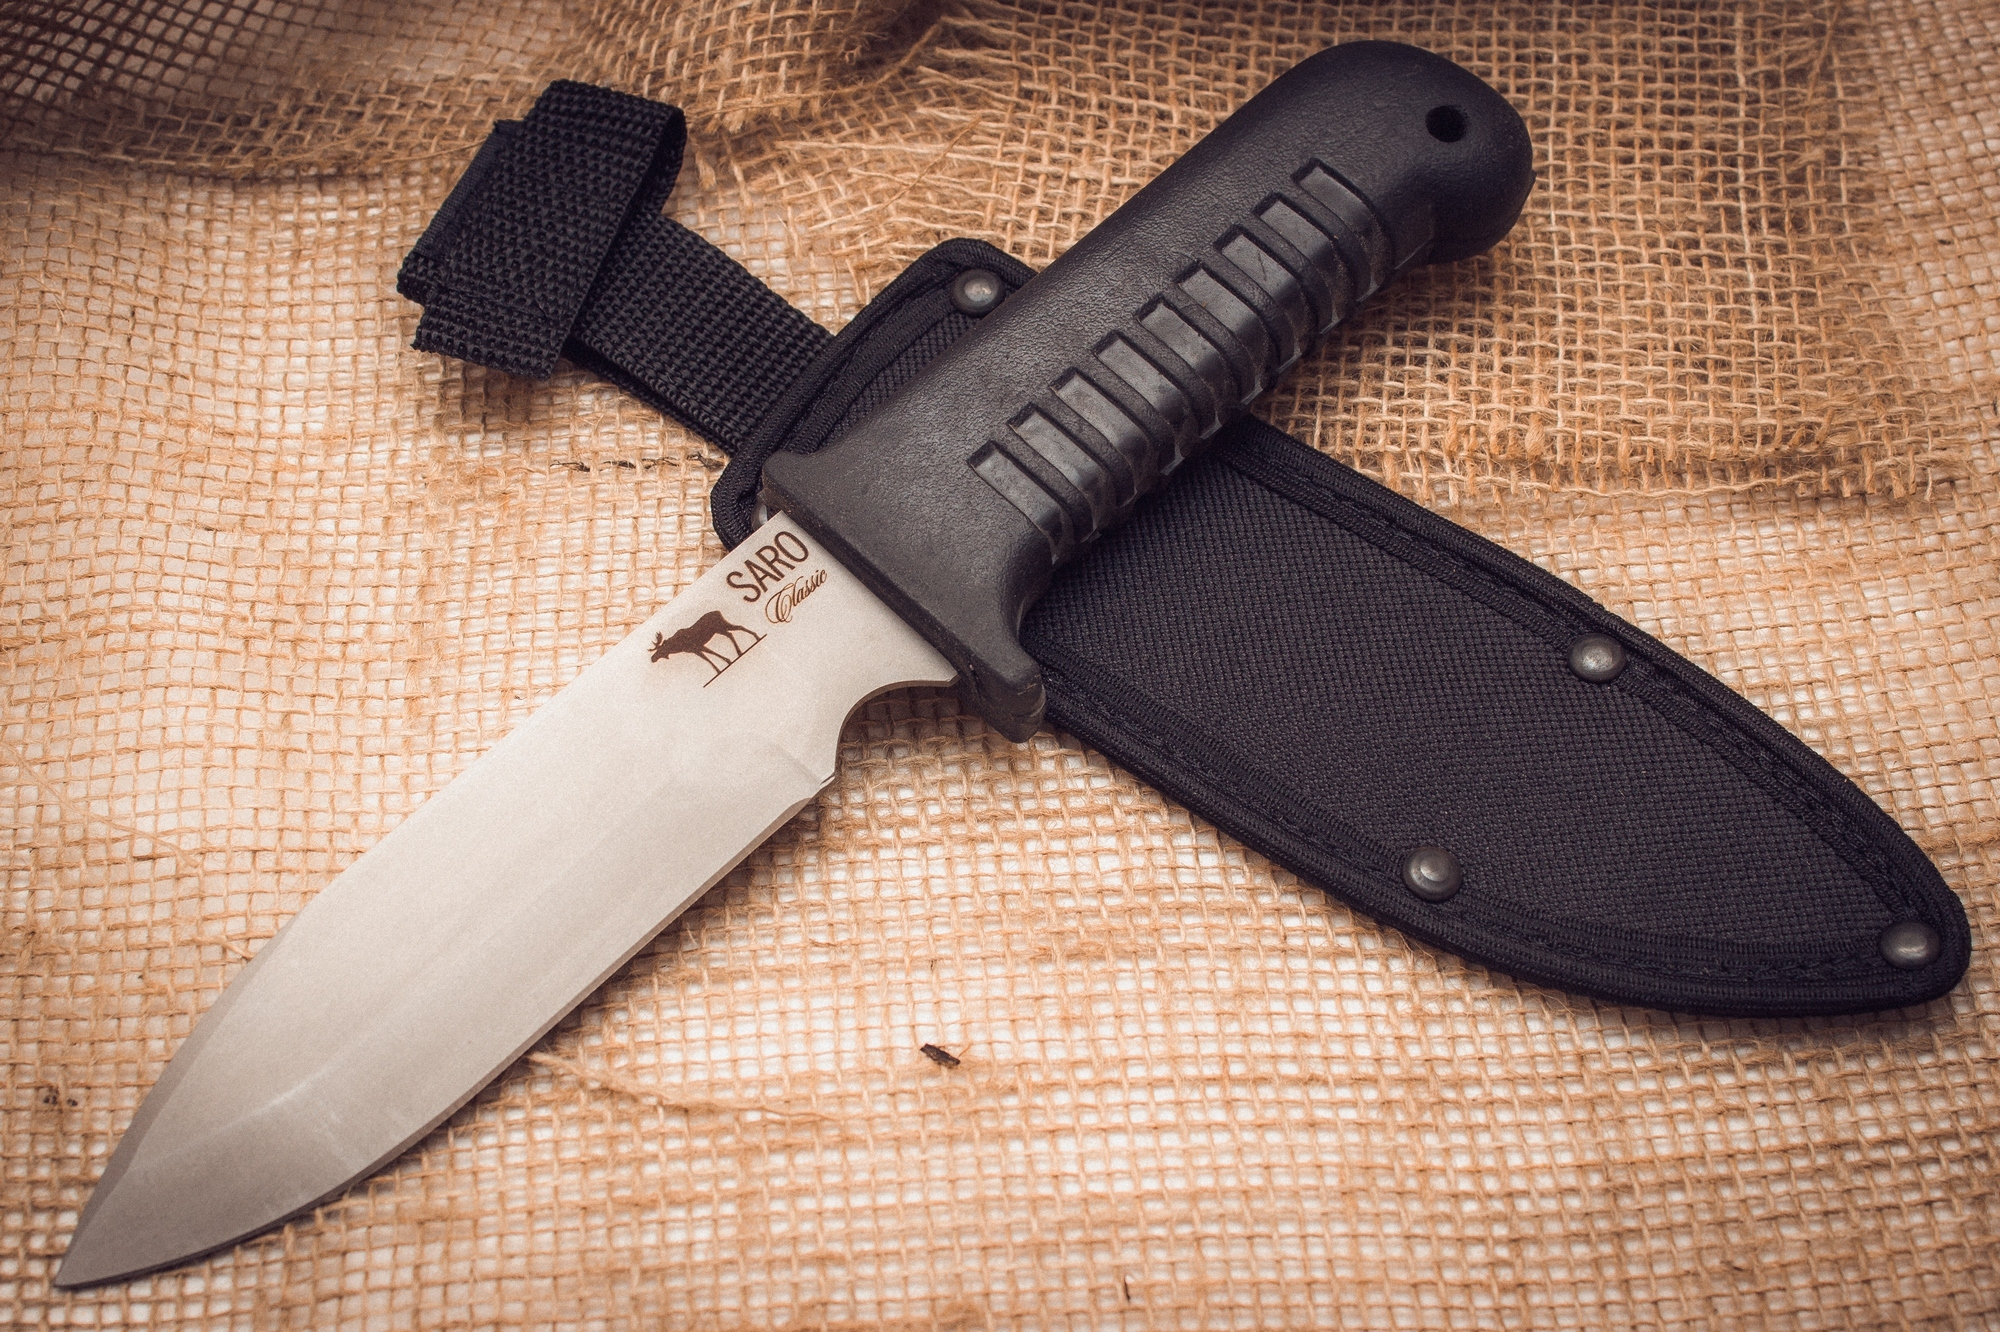 Нож КаштанНожи Ворсма<br>Комплектация: нож Катран(рукоять металл-резина), ножны из кордуры, сертификат.<br>